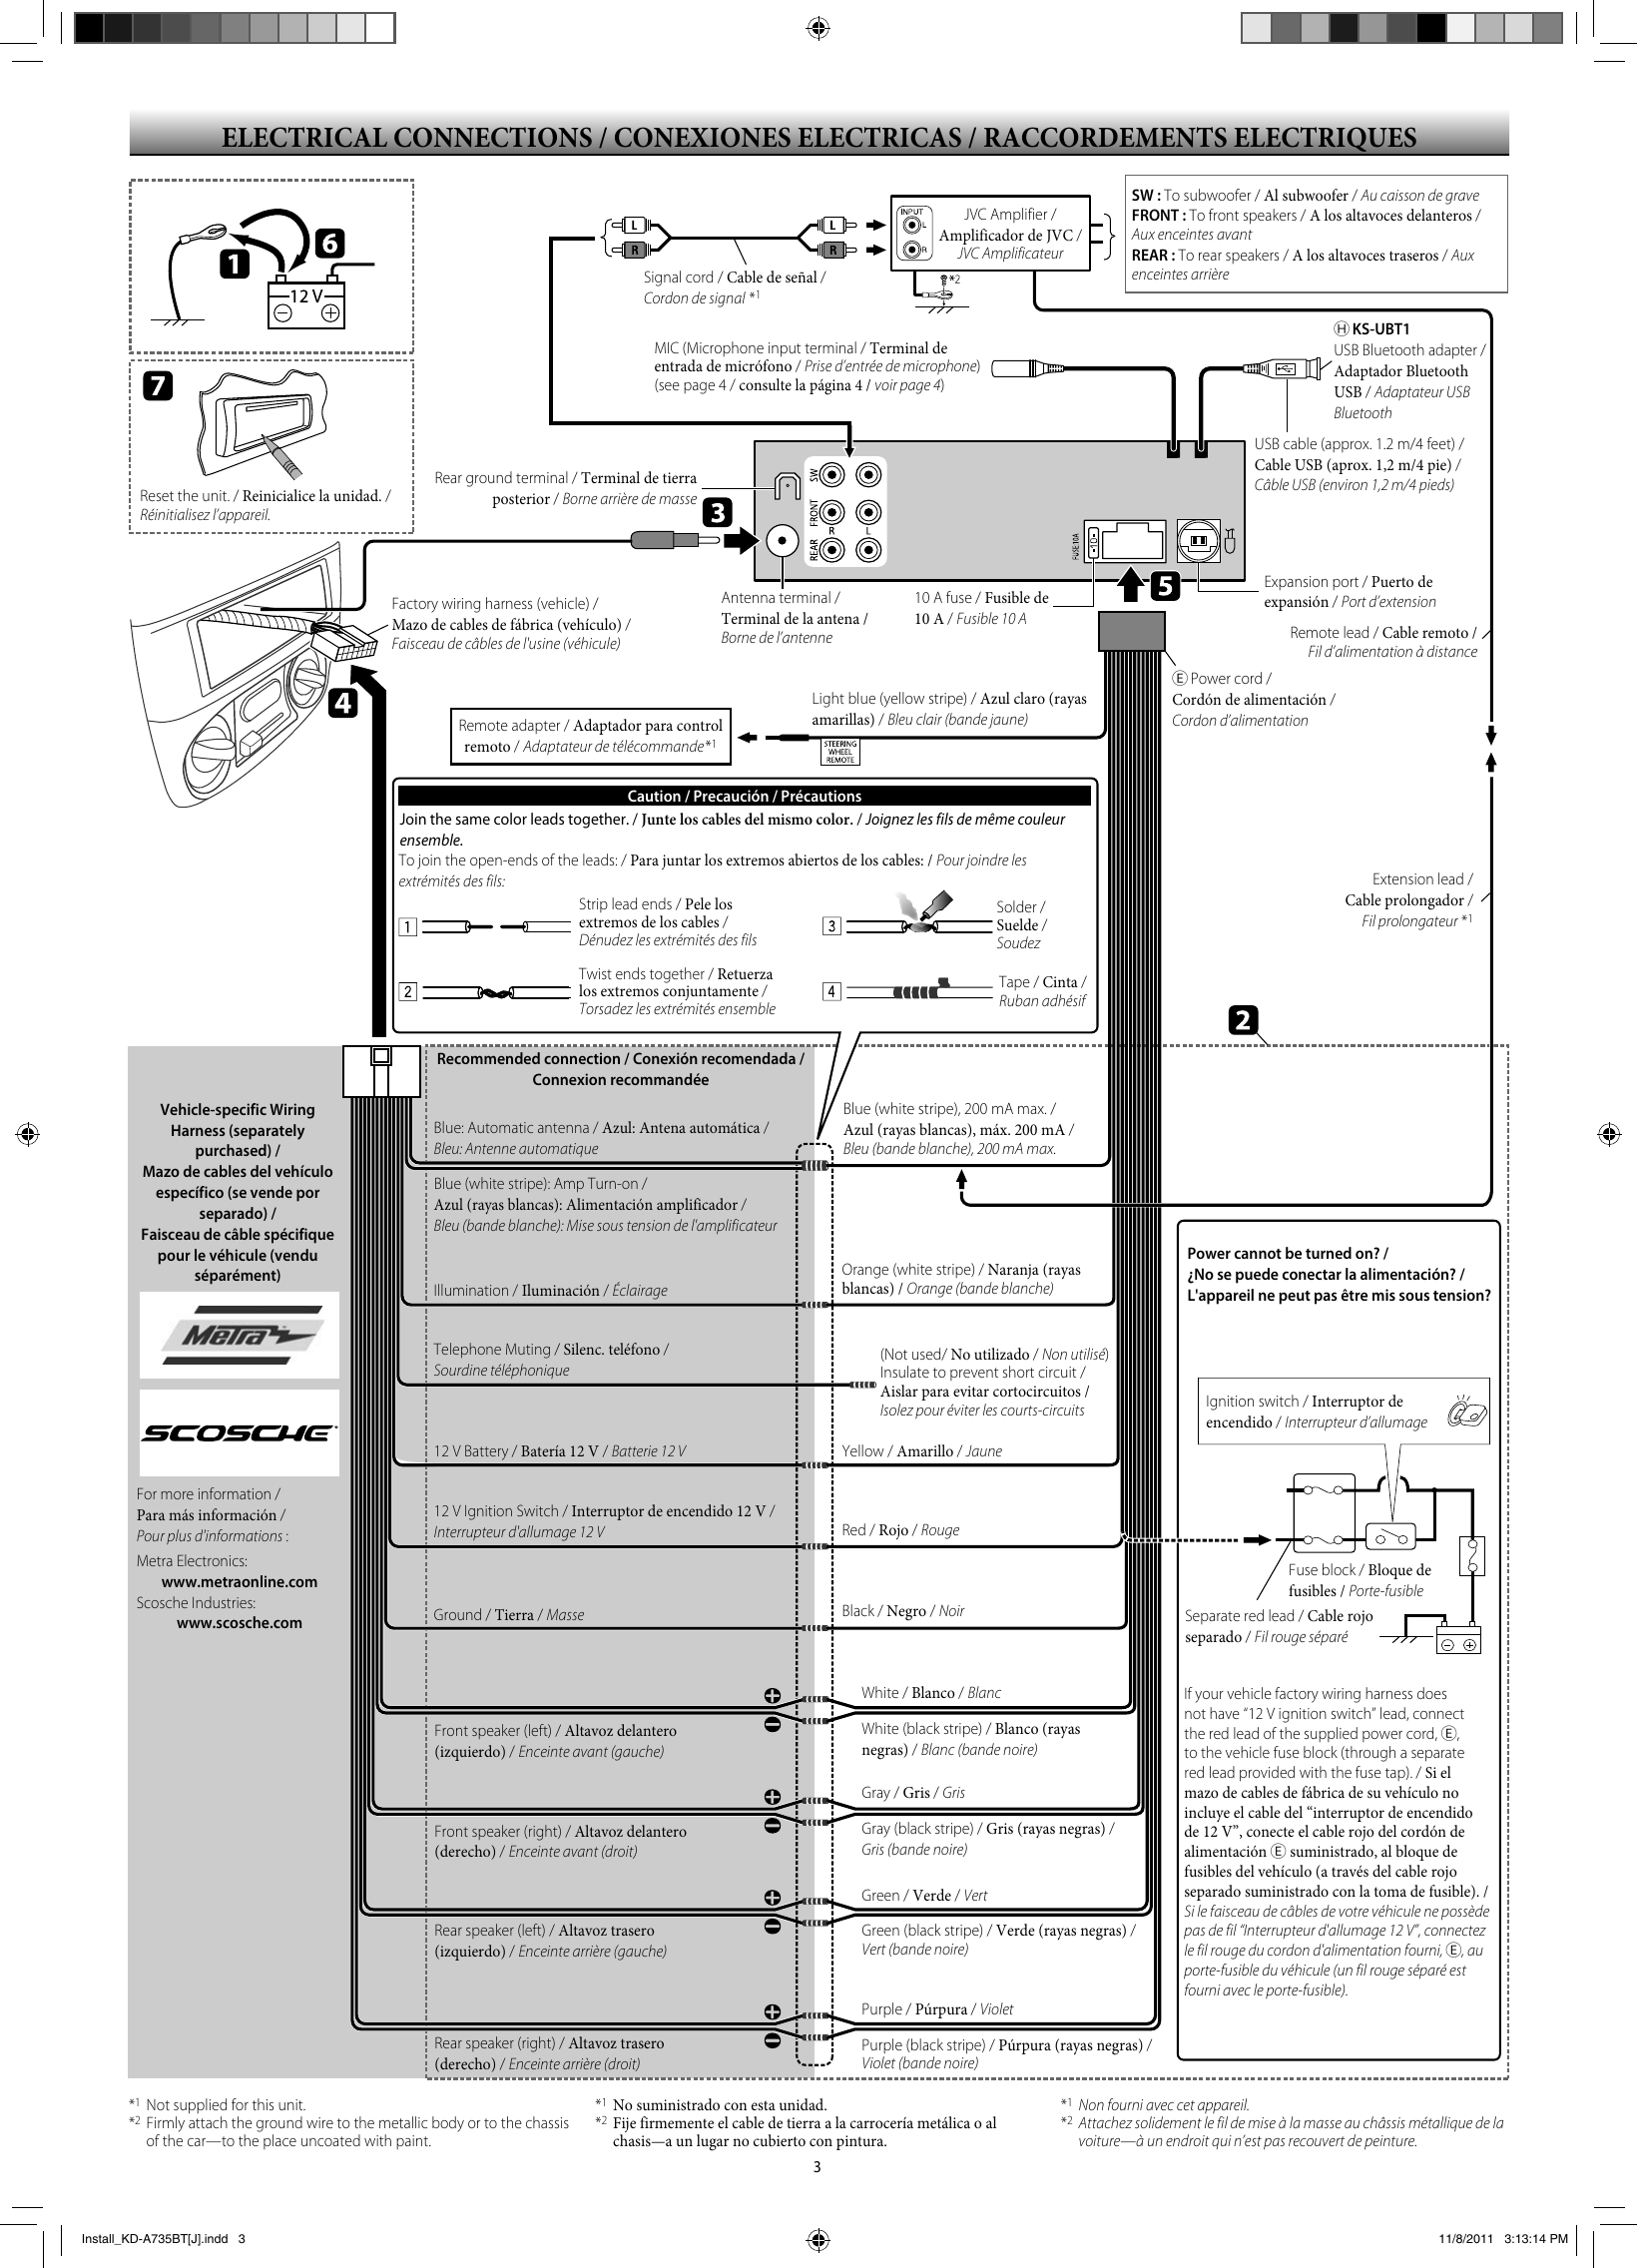 2CA6 Jvc Kd R730bt Car Stereo Wiring Diagram | #Digital ... Jvc Headunit Wiring Diagram on sub wiring diagram, snap on verus wiring diagram, grasshopper 721d wiring diagram, aux input wiring diagram, pioneer avh-p4100dvd wiring diagram, head unit wiring diagram,